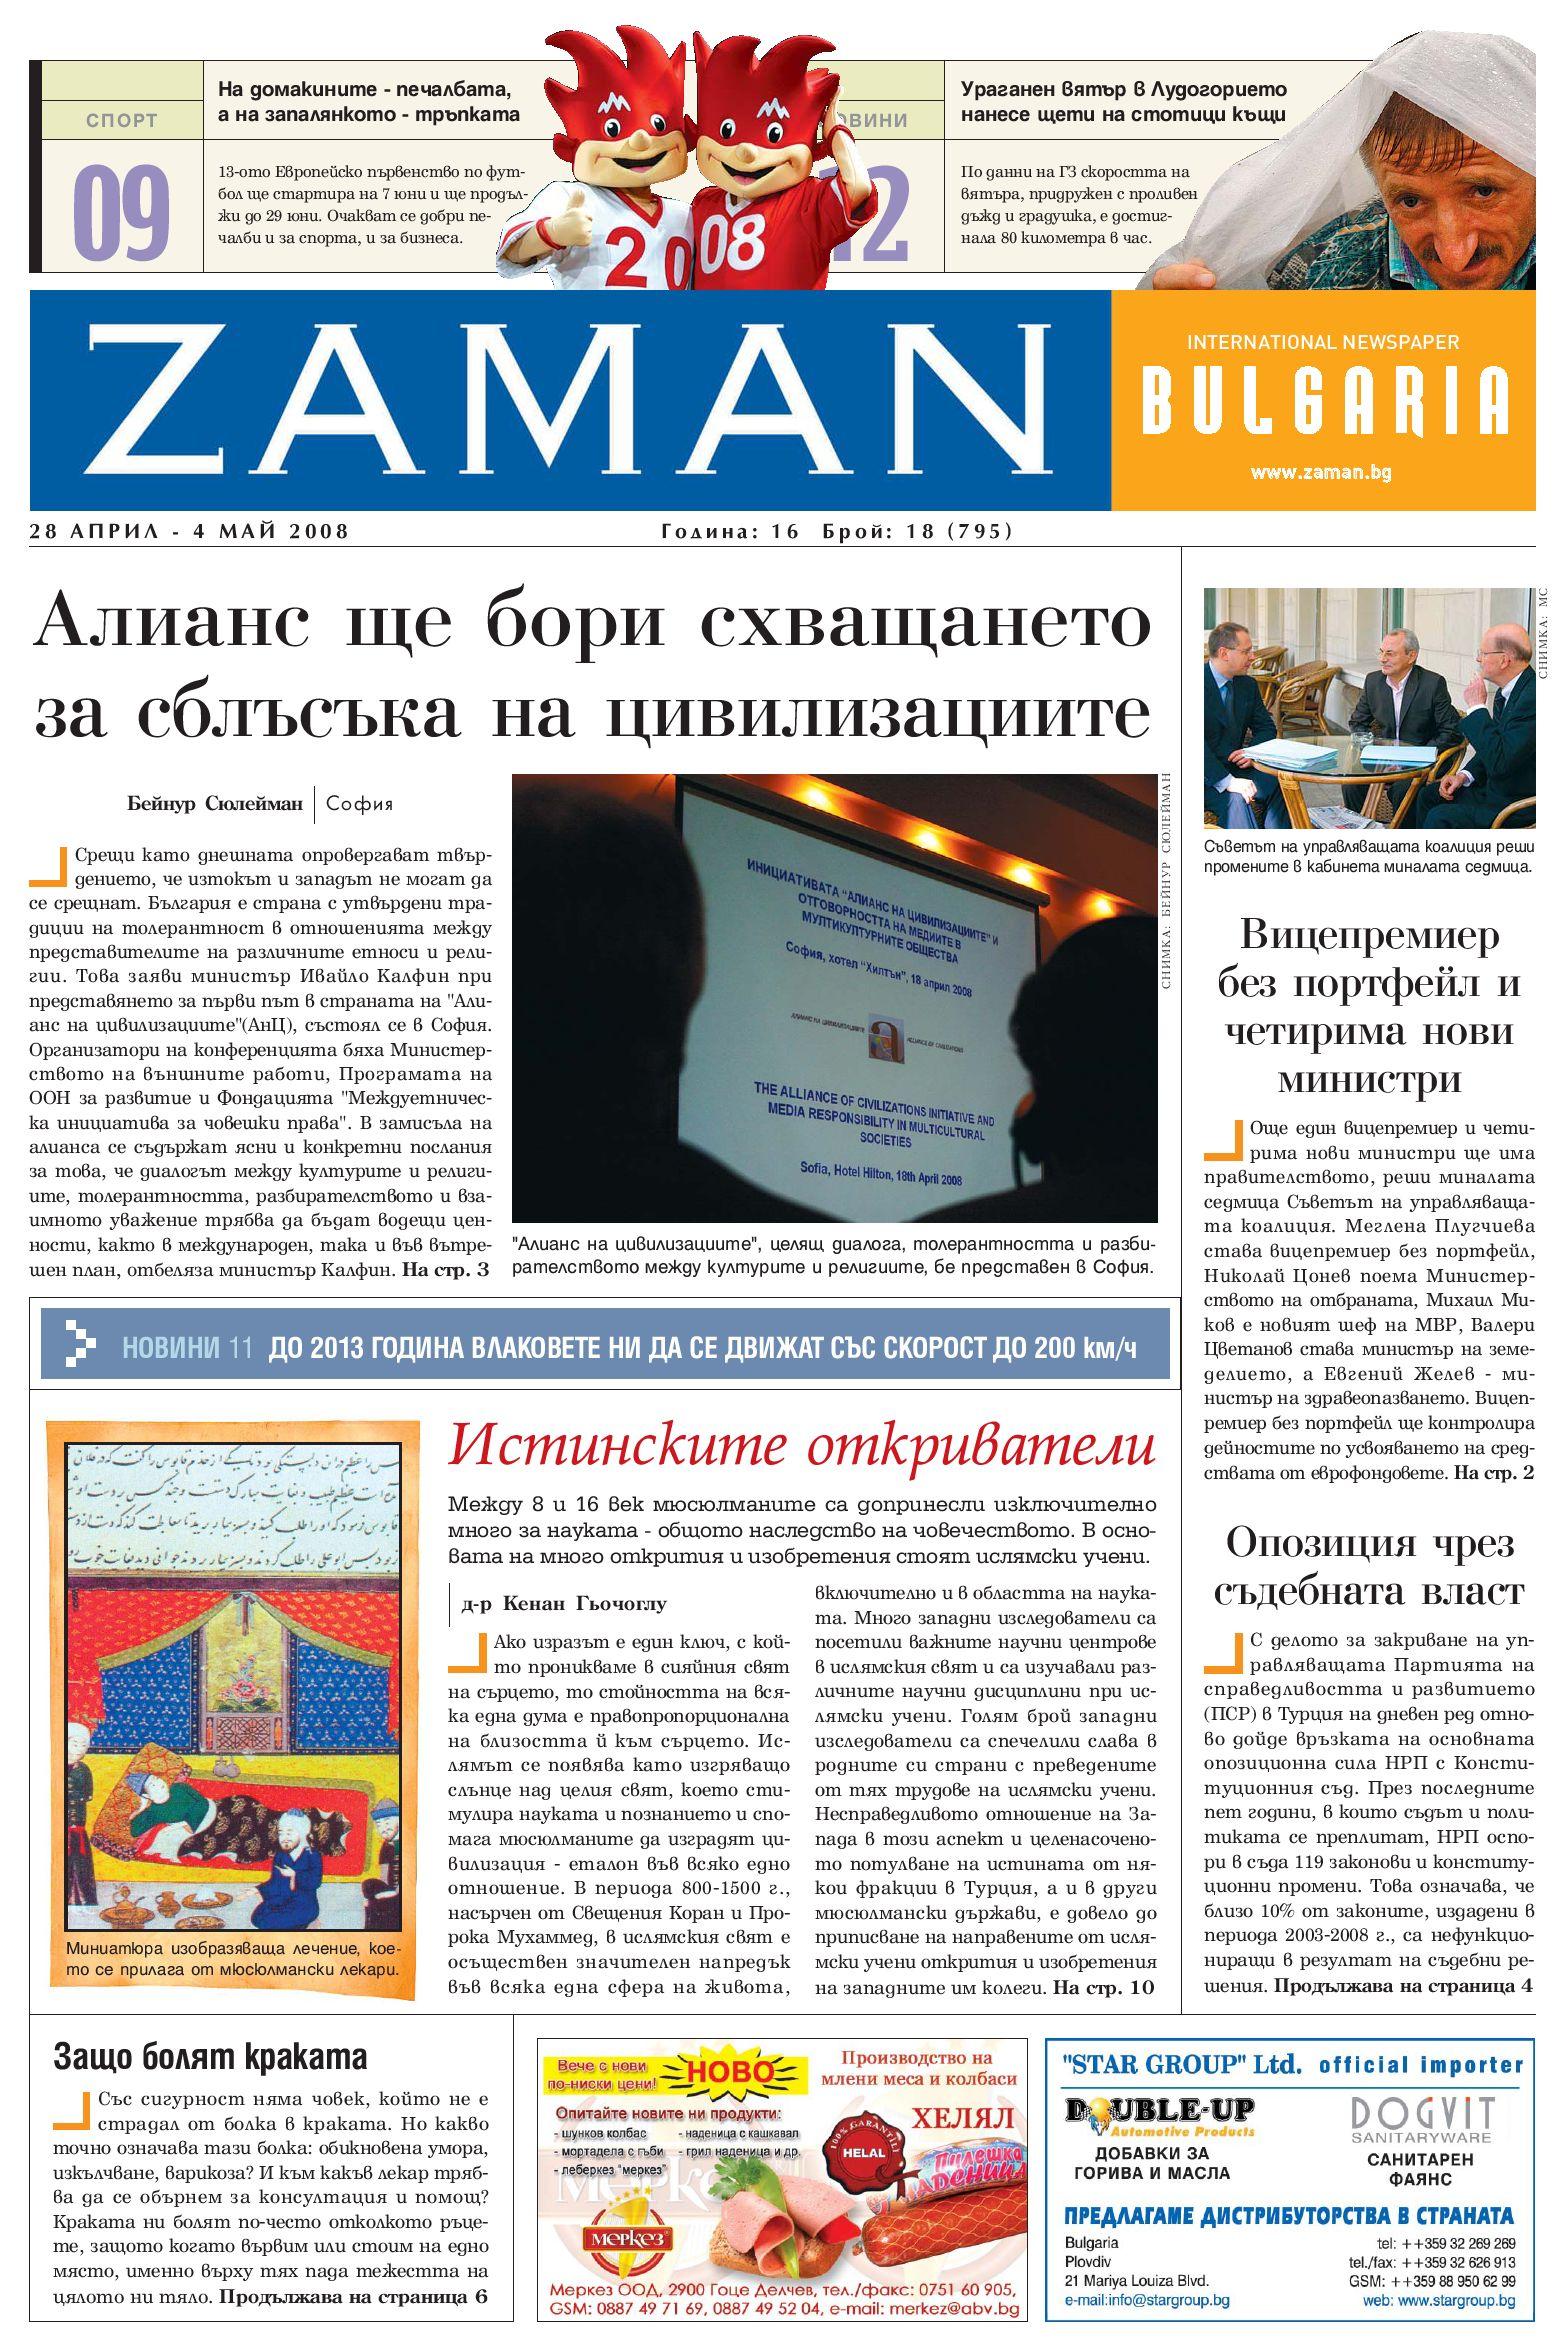 Zaman Bulgaristan 28 Nisan 2008 By Zaman Bulgaristan Issuu